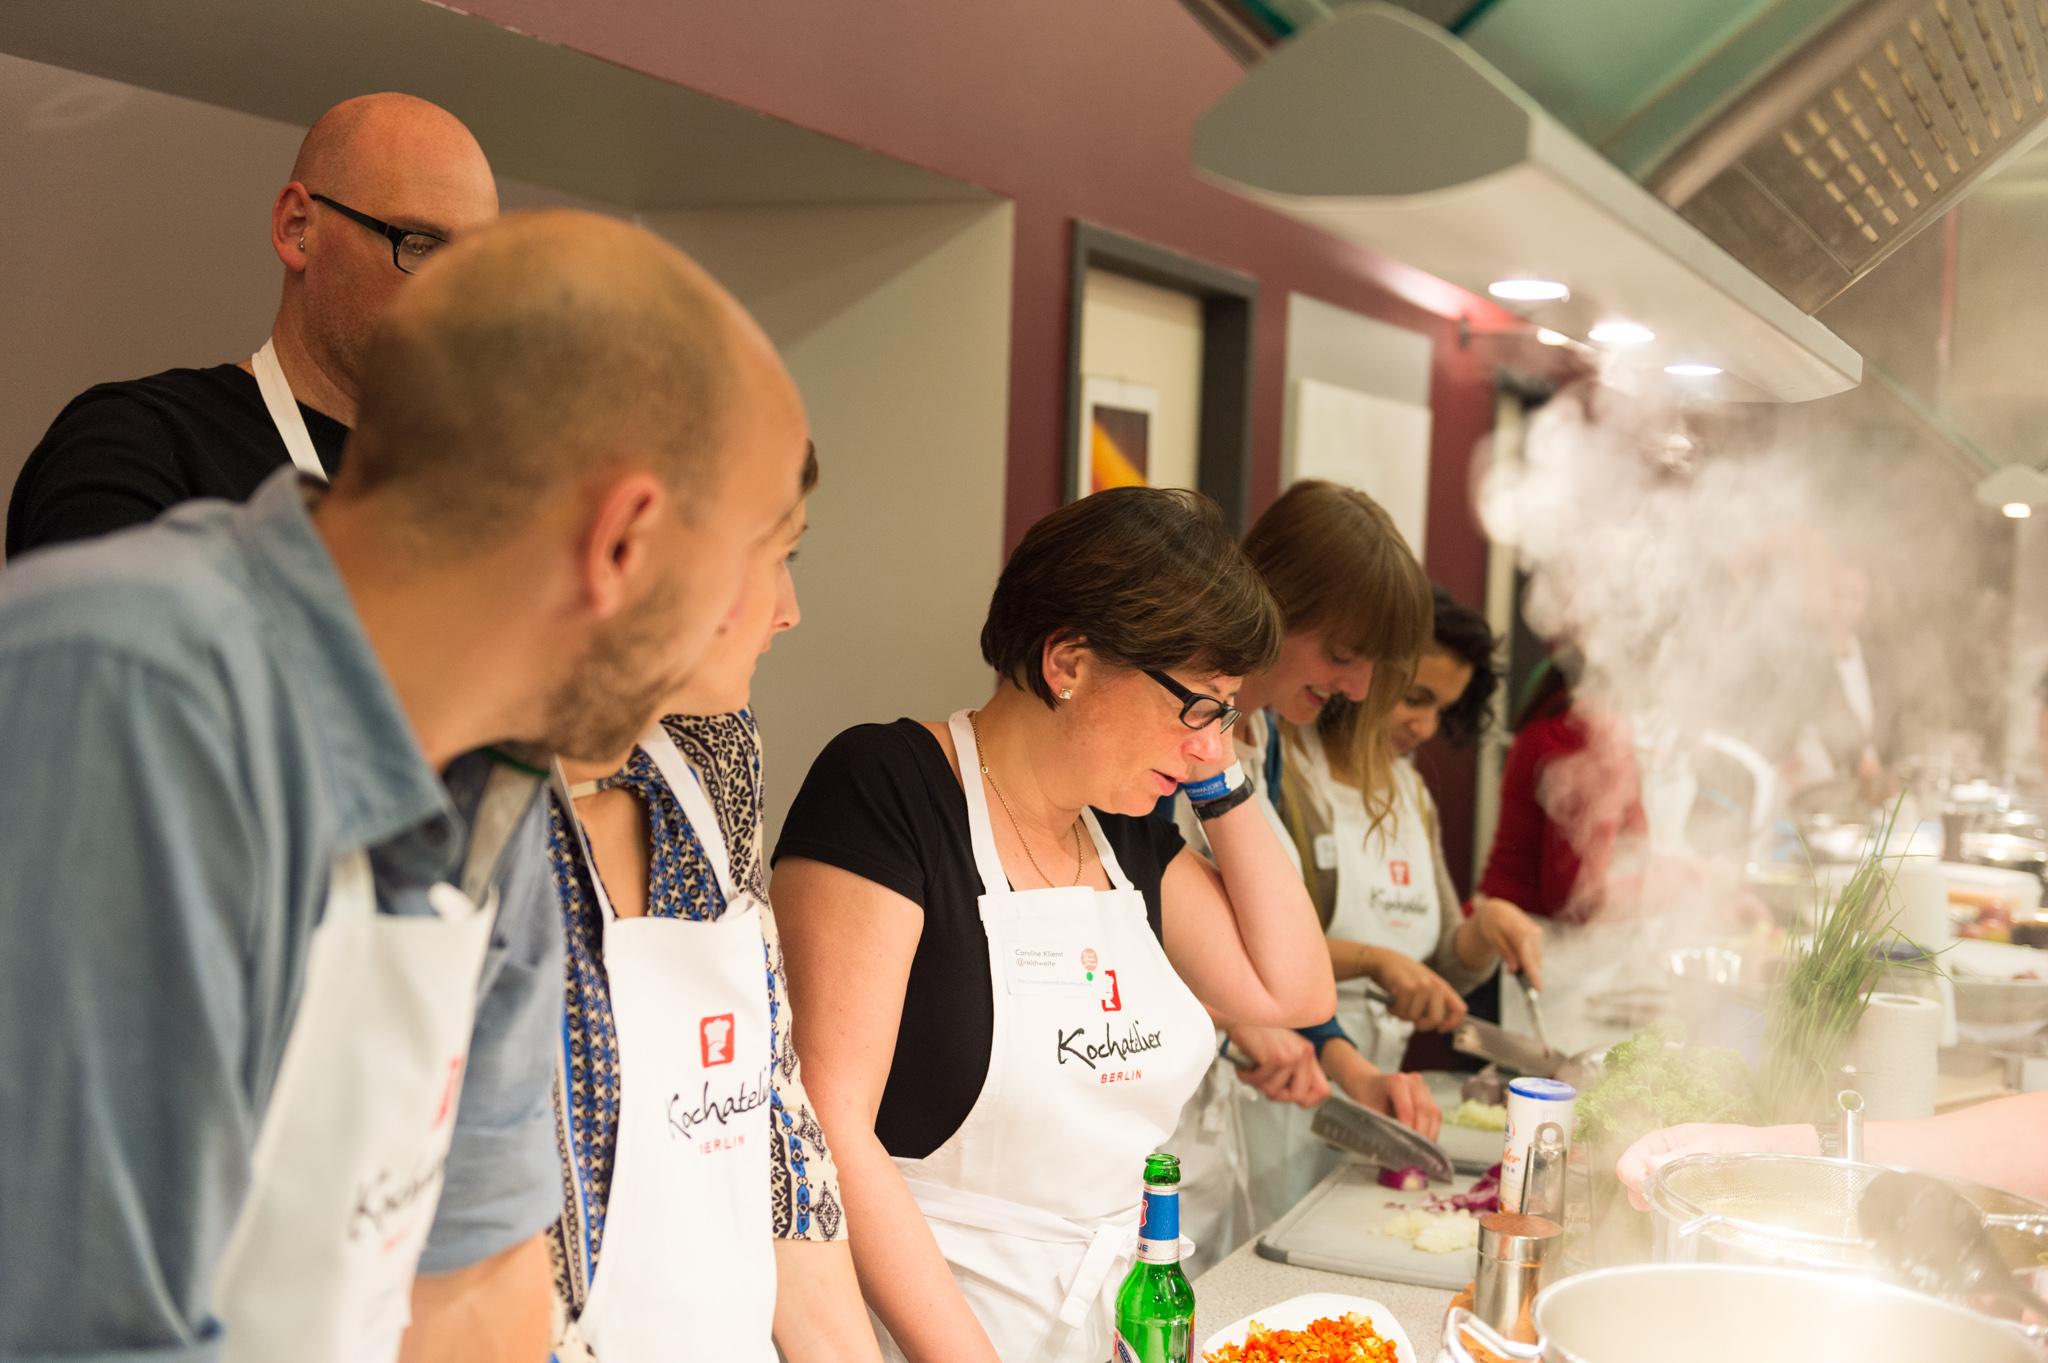 Digital Cuisine - Social Media Dinner meets Kochatelier #Digicui